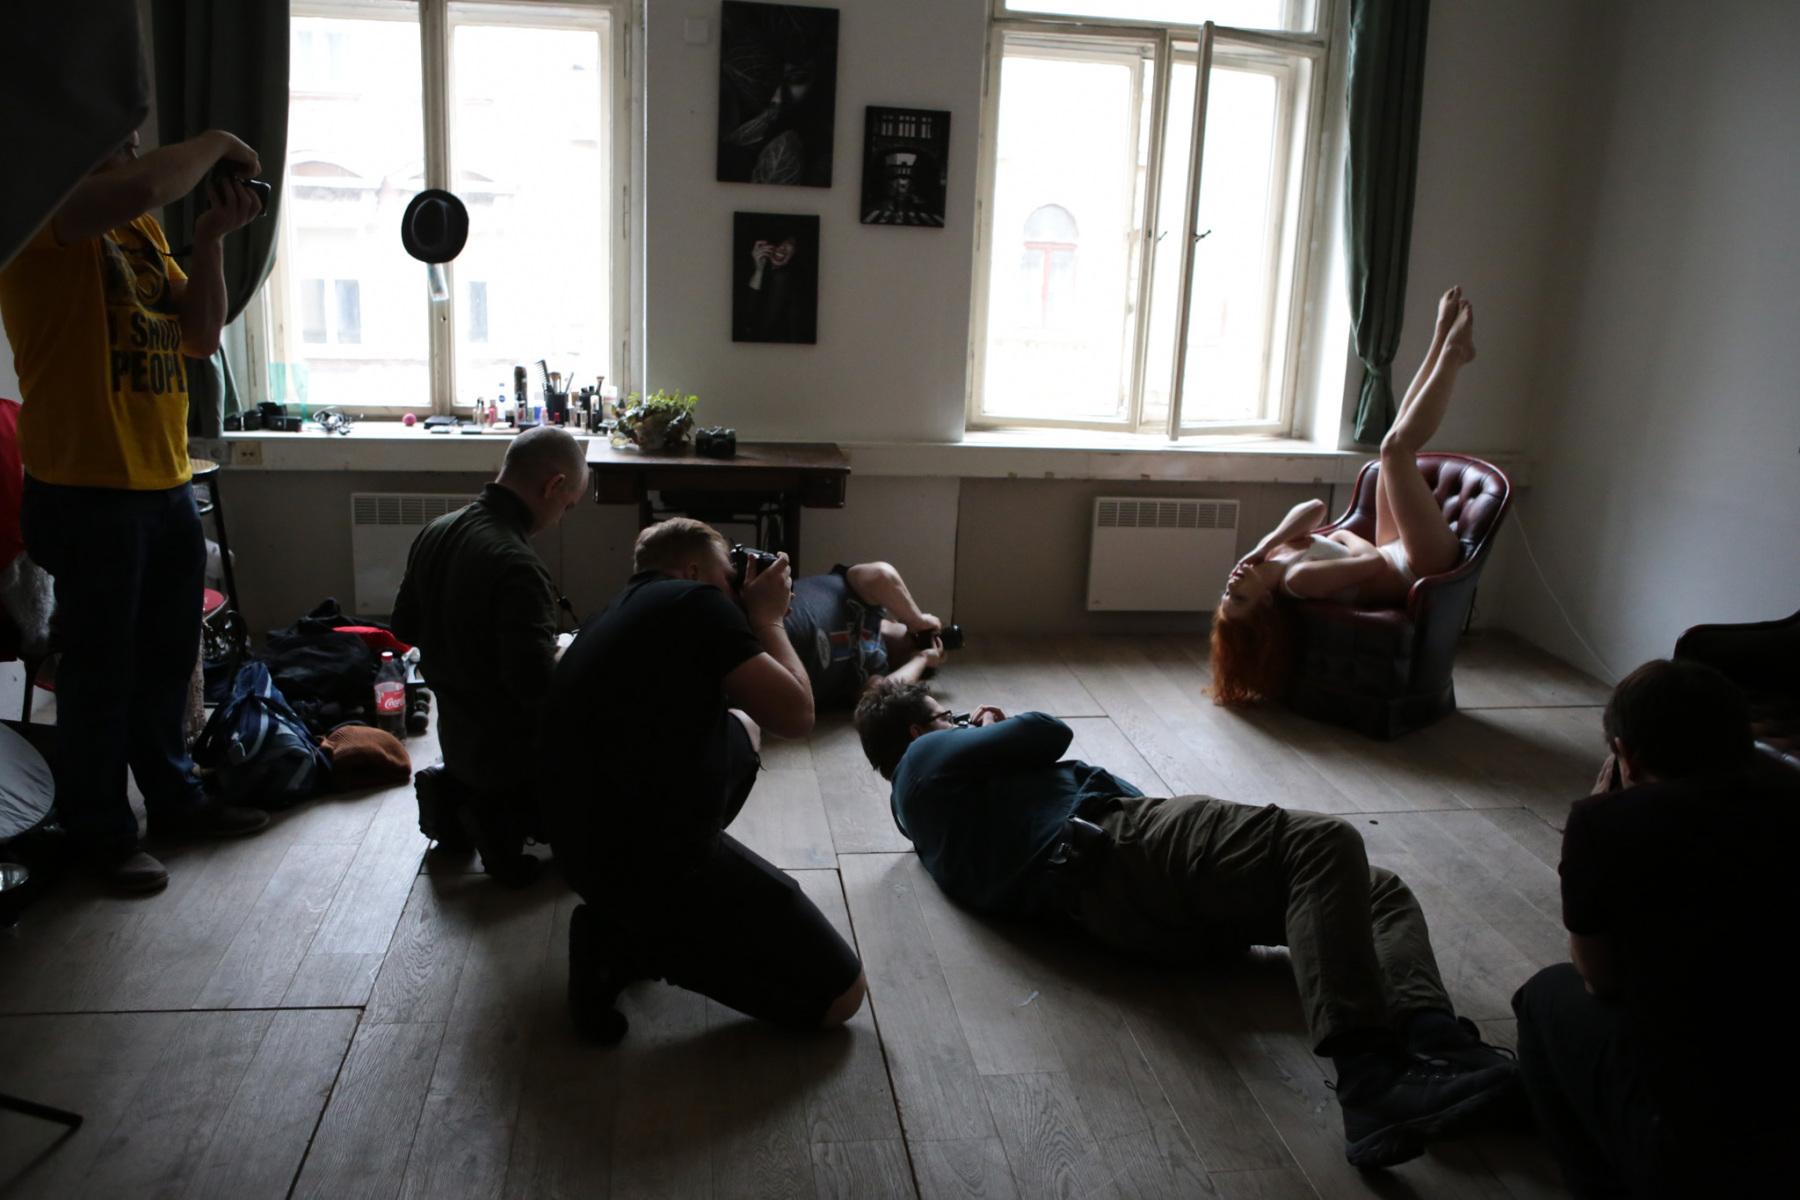 Katerina_Janisova_Masterclass_Workshop_Fotokurz-17